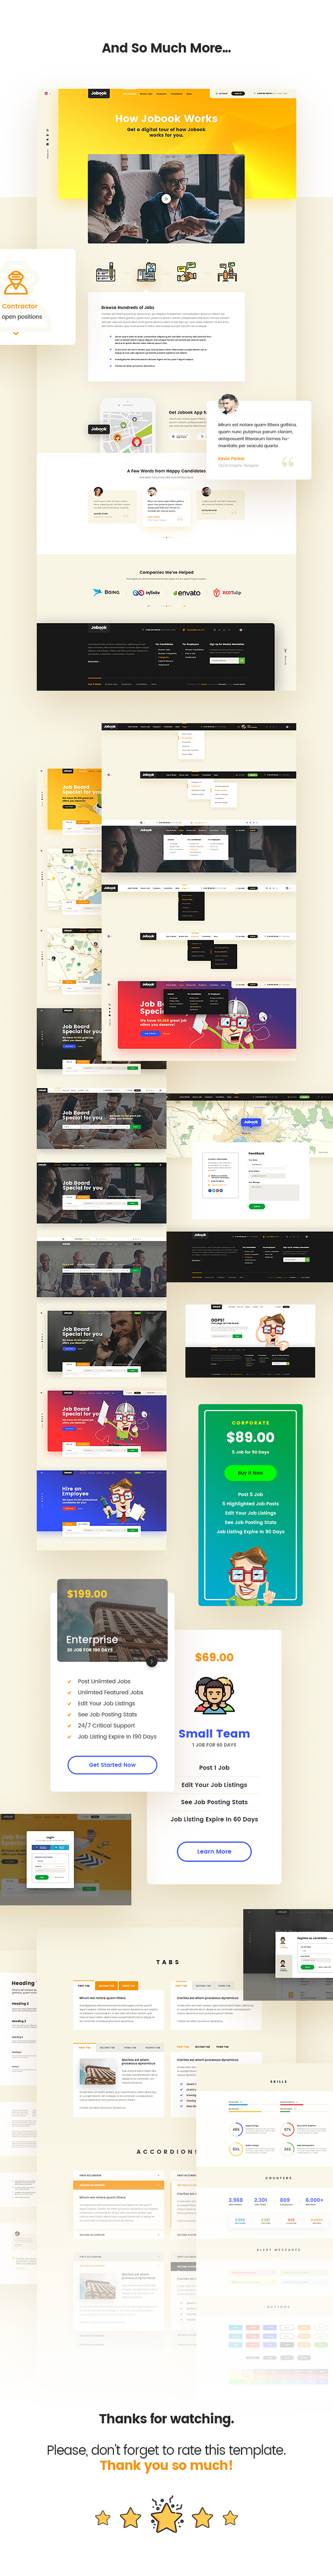 Jobook - A Unique Job Board Website PSD Template - 9